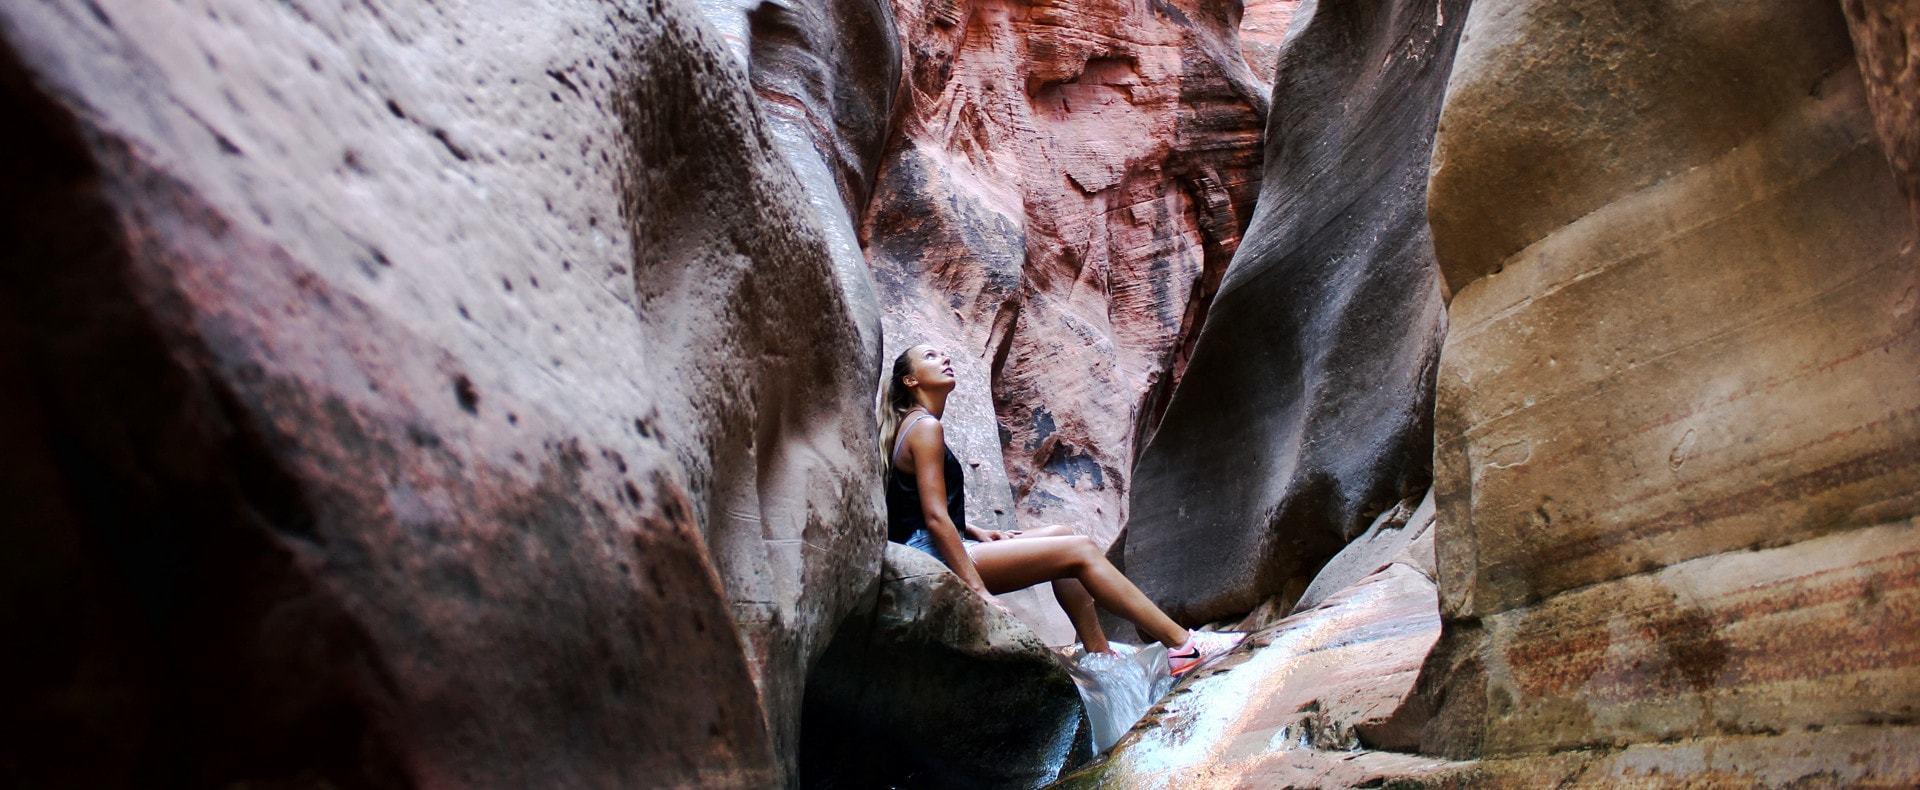 Kanaracreek canyon aux USA – Page d'accueil